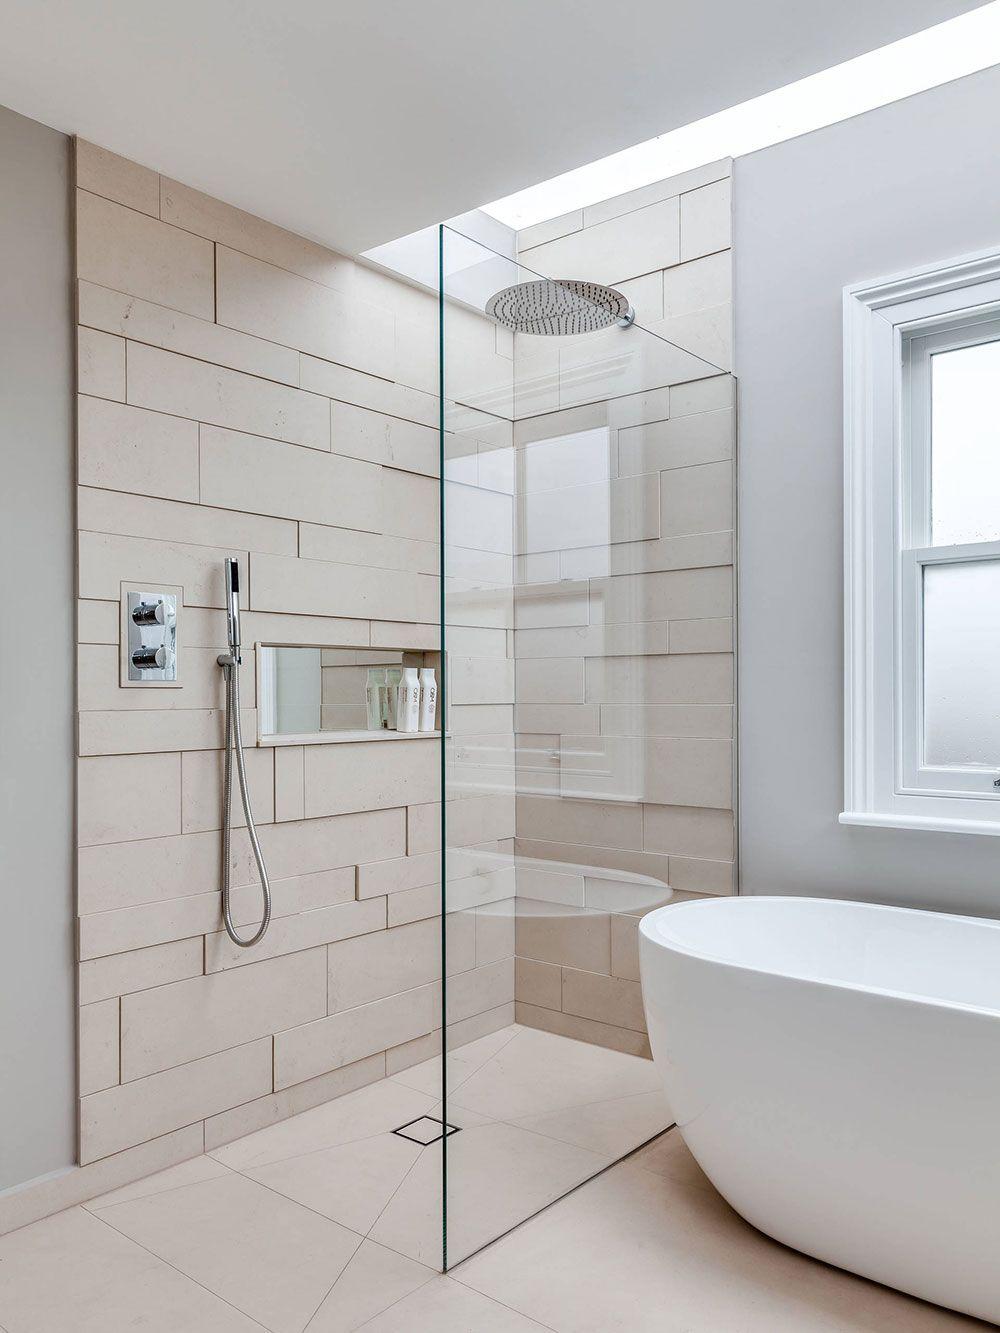 Wet Room Design: Wet Room Decor And Design Ideas